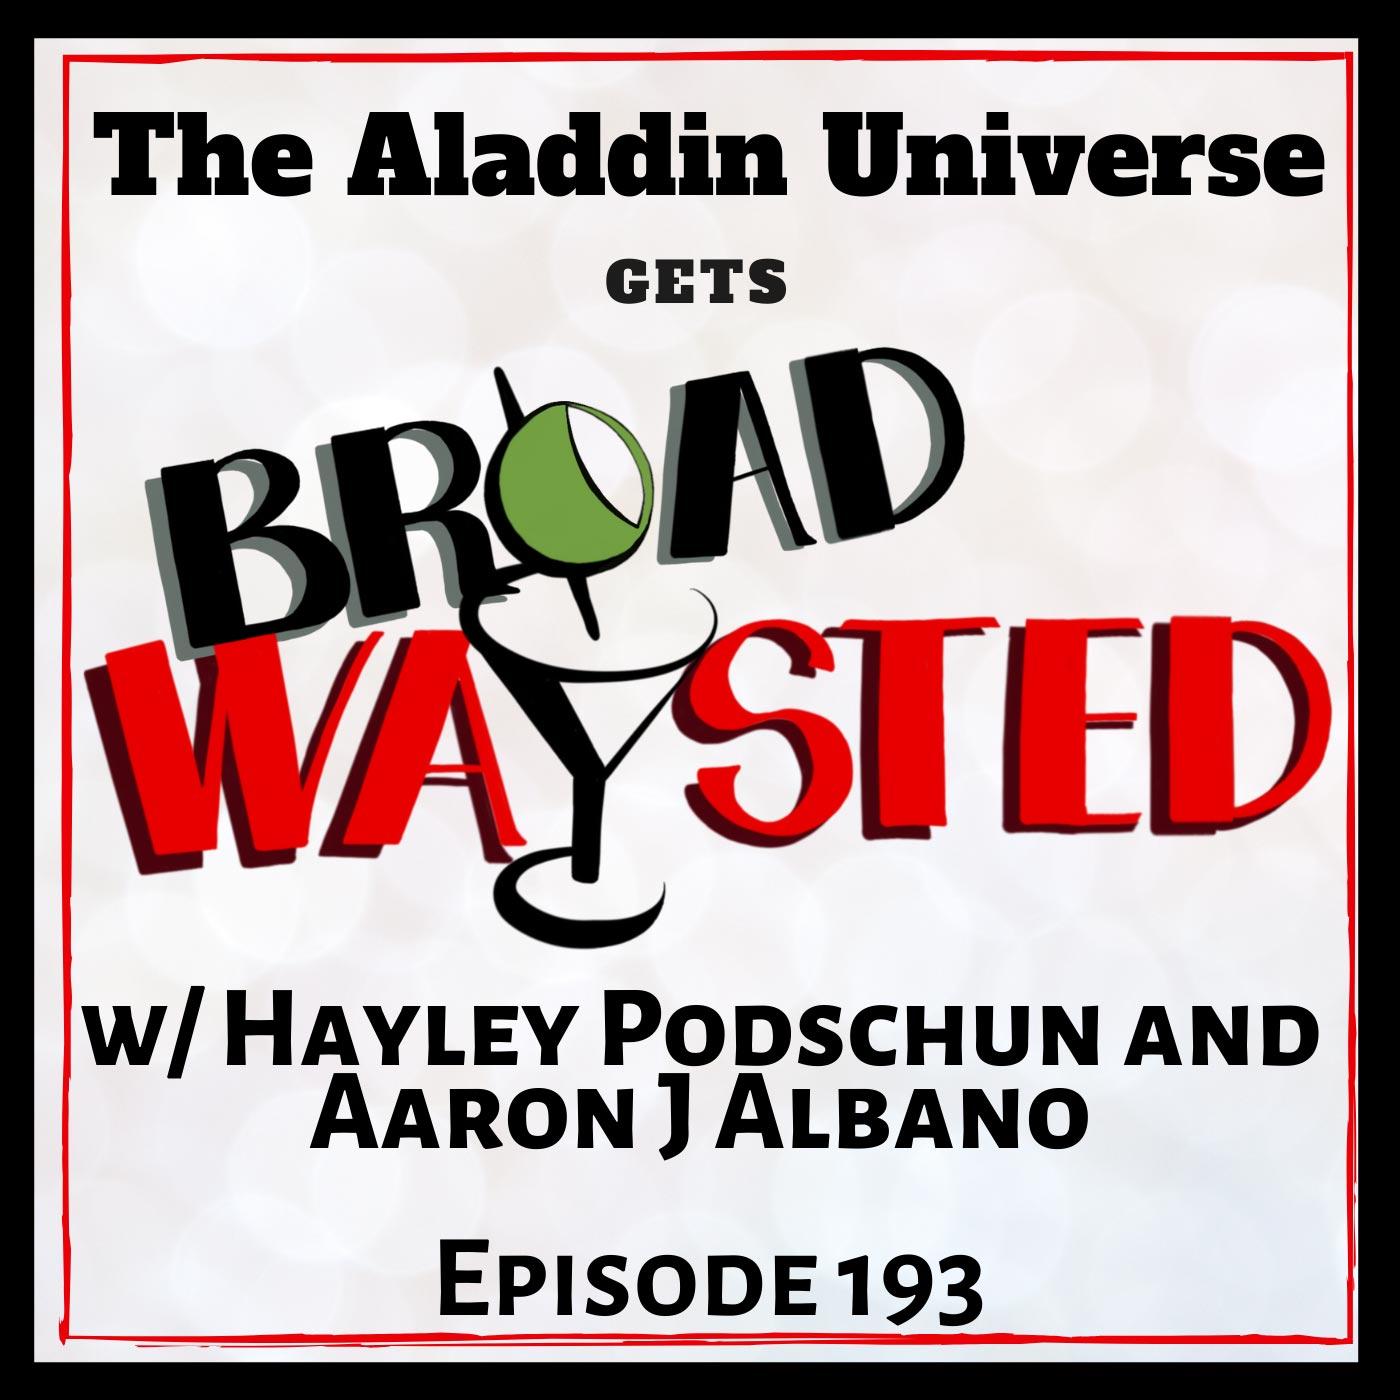 Broadwaysted Episode 193 Hayley Podschun, Aaron J Albano